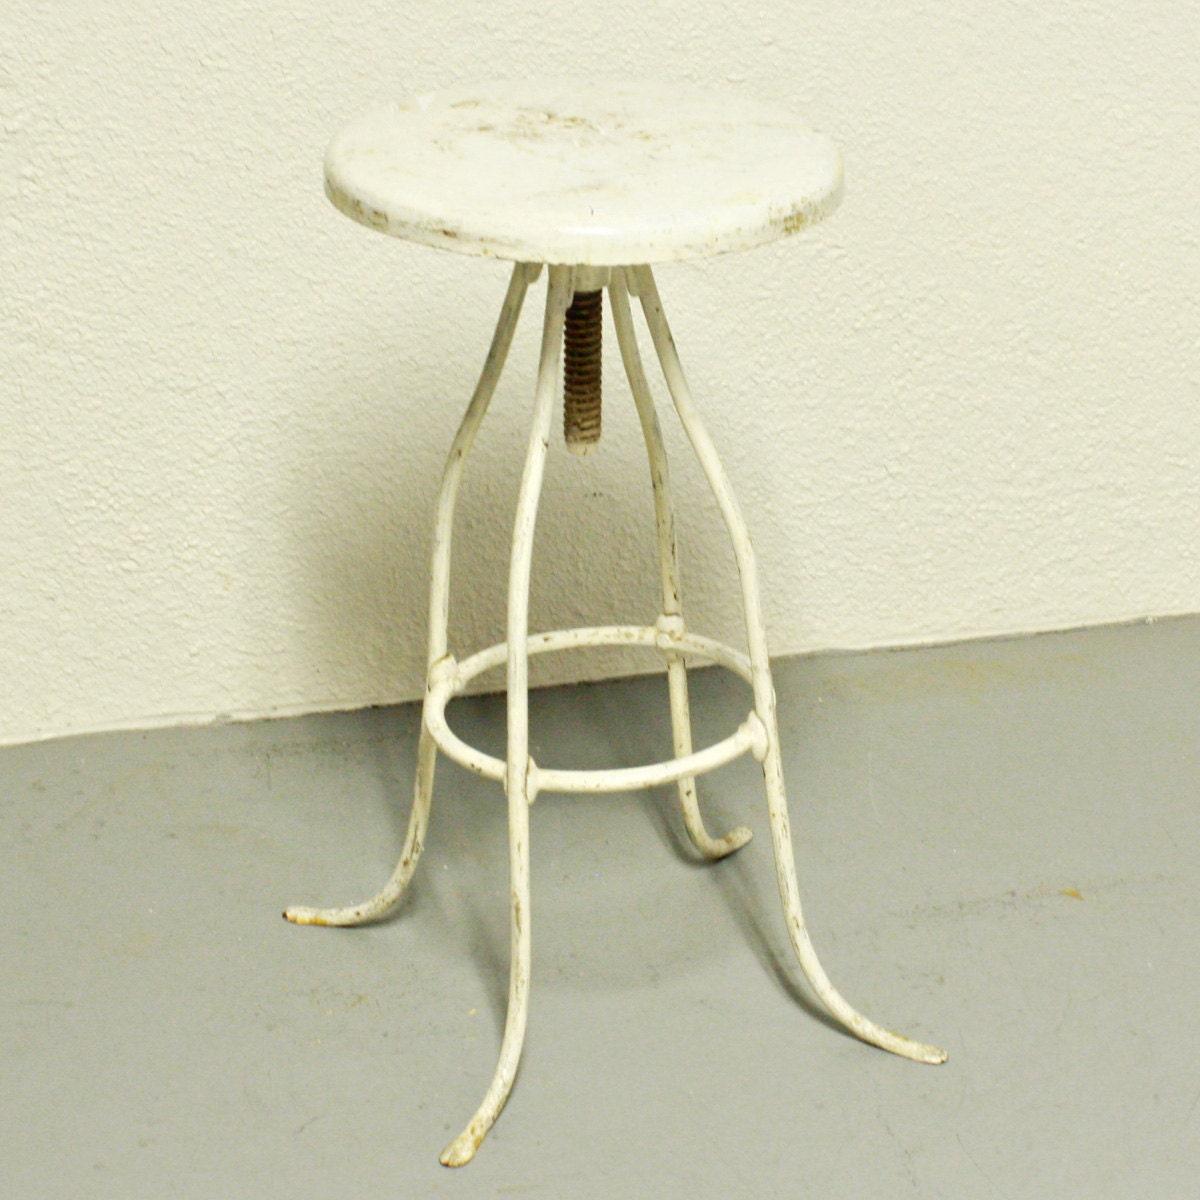 Vintage stool screw top swivel seat metal seat - Screw top bar stools ...